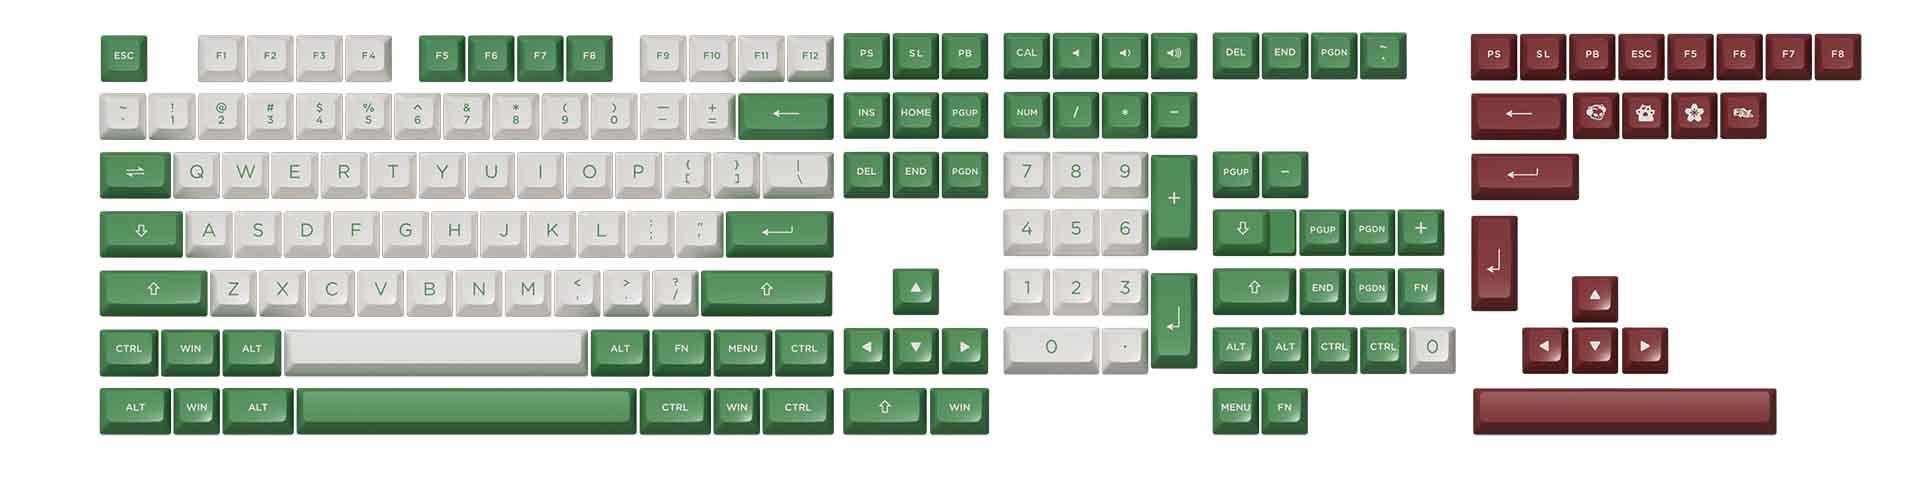 akko-keycap-set-matcha-red-bean-pbt-double-shot-asa-profile-158-nut